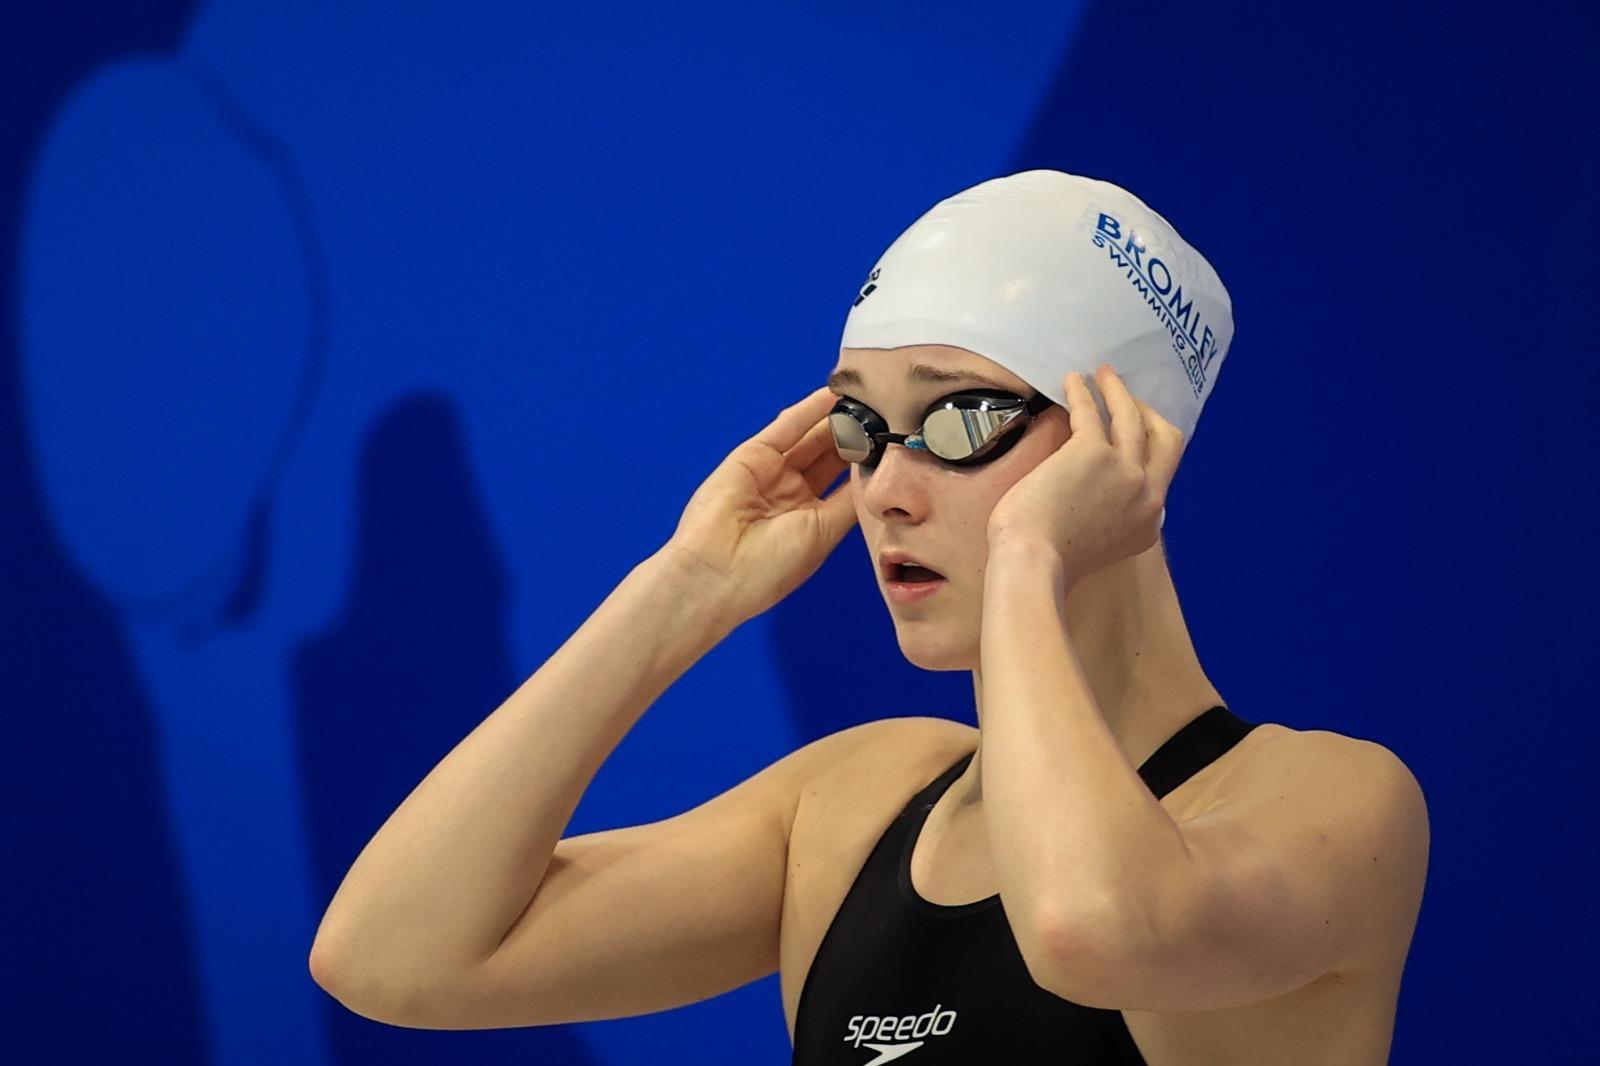 Photo credit: Georgie Kerr, British Swimming